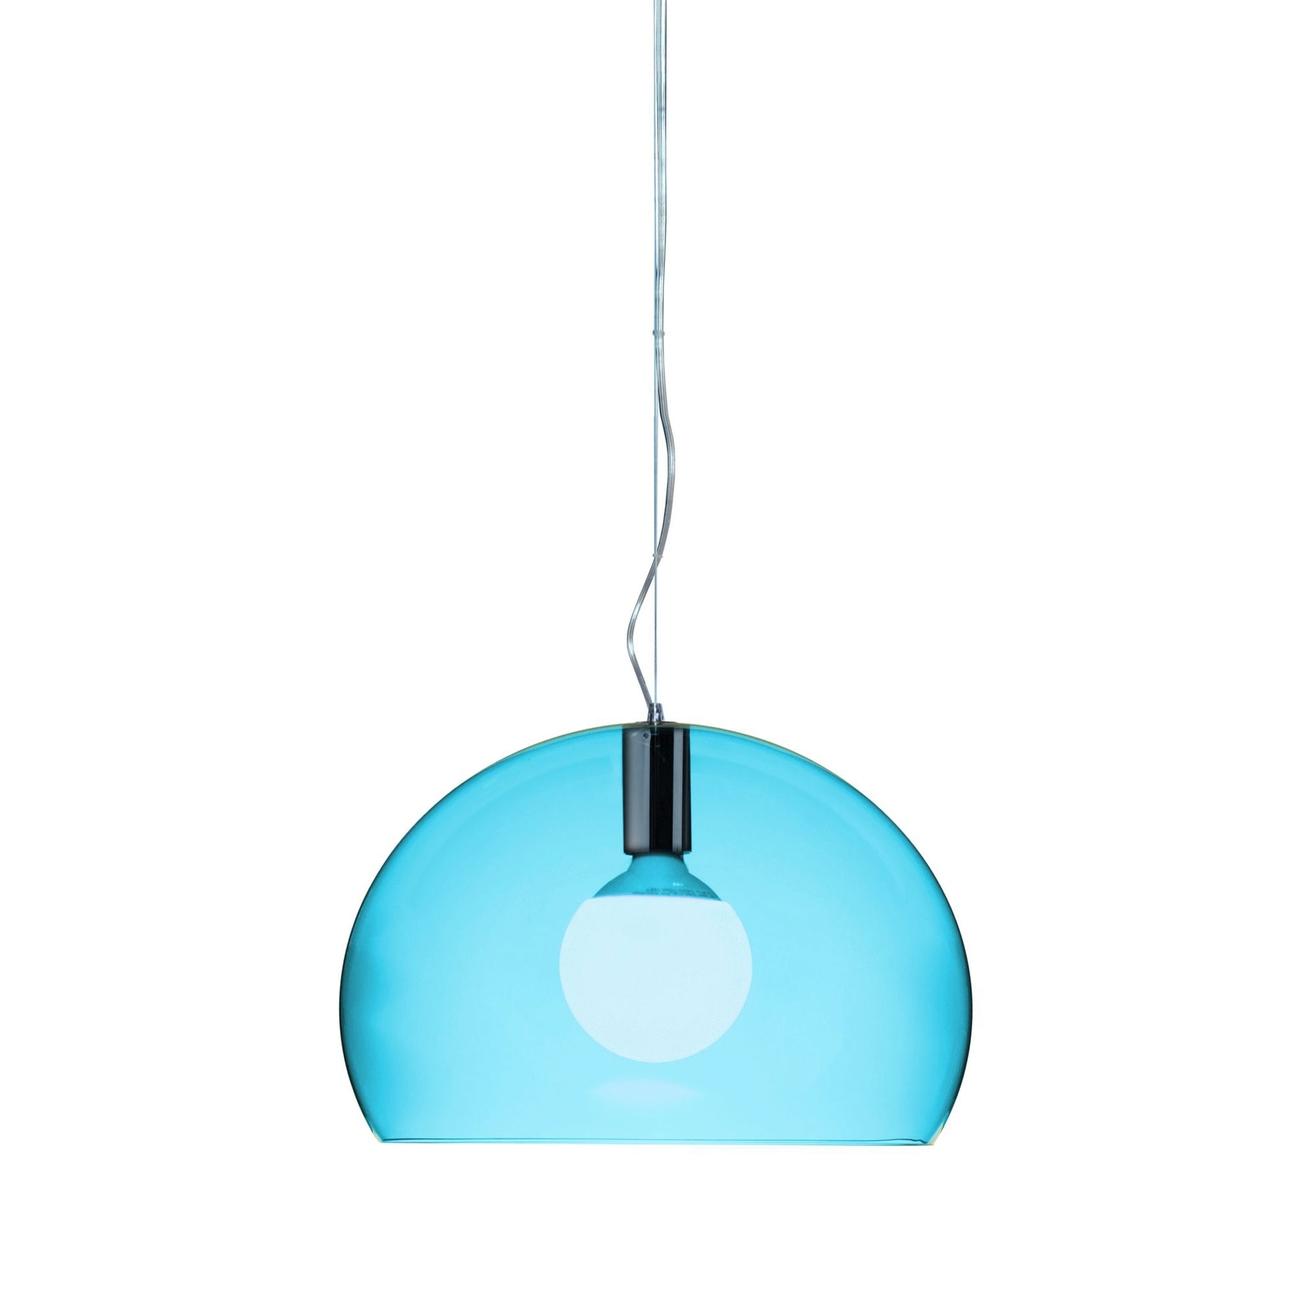 Kartell Small Fly hanglamp-Petrol